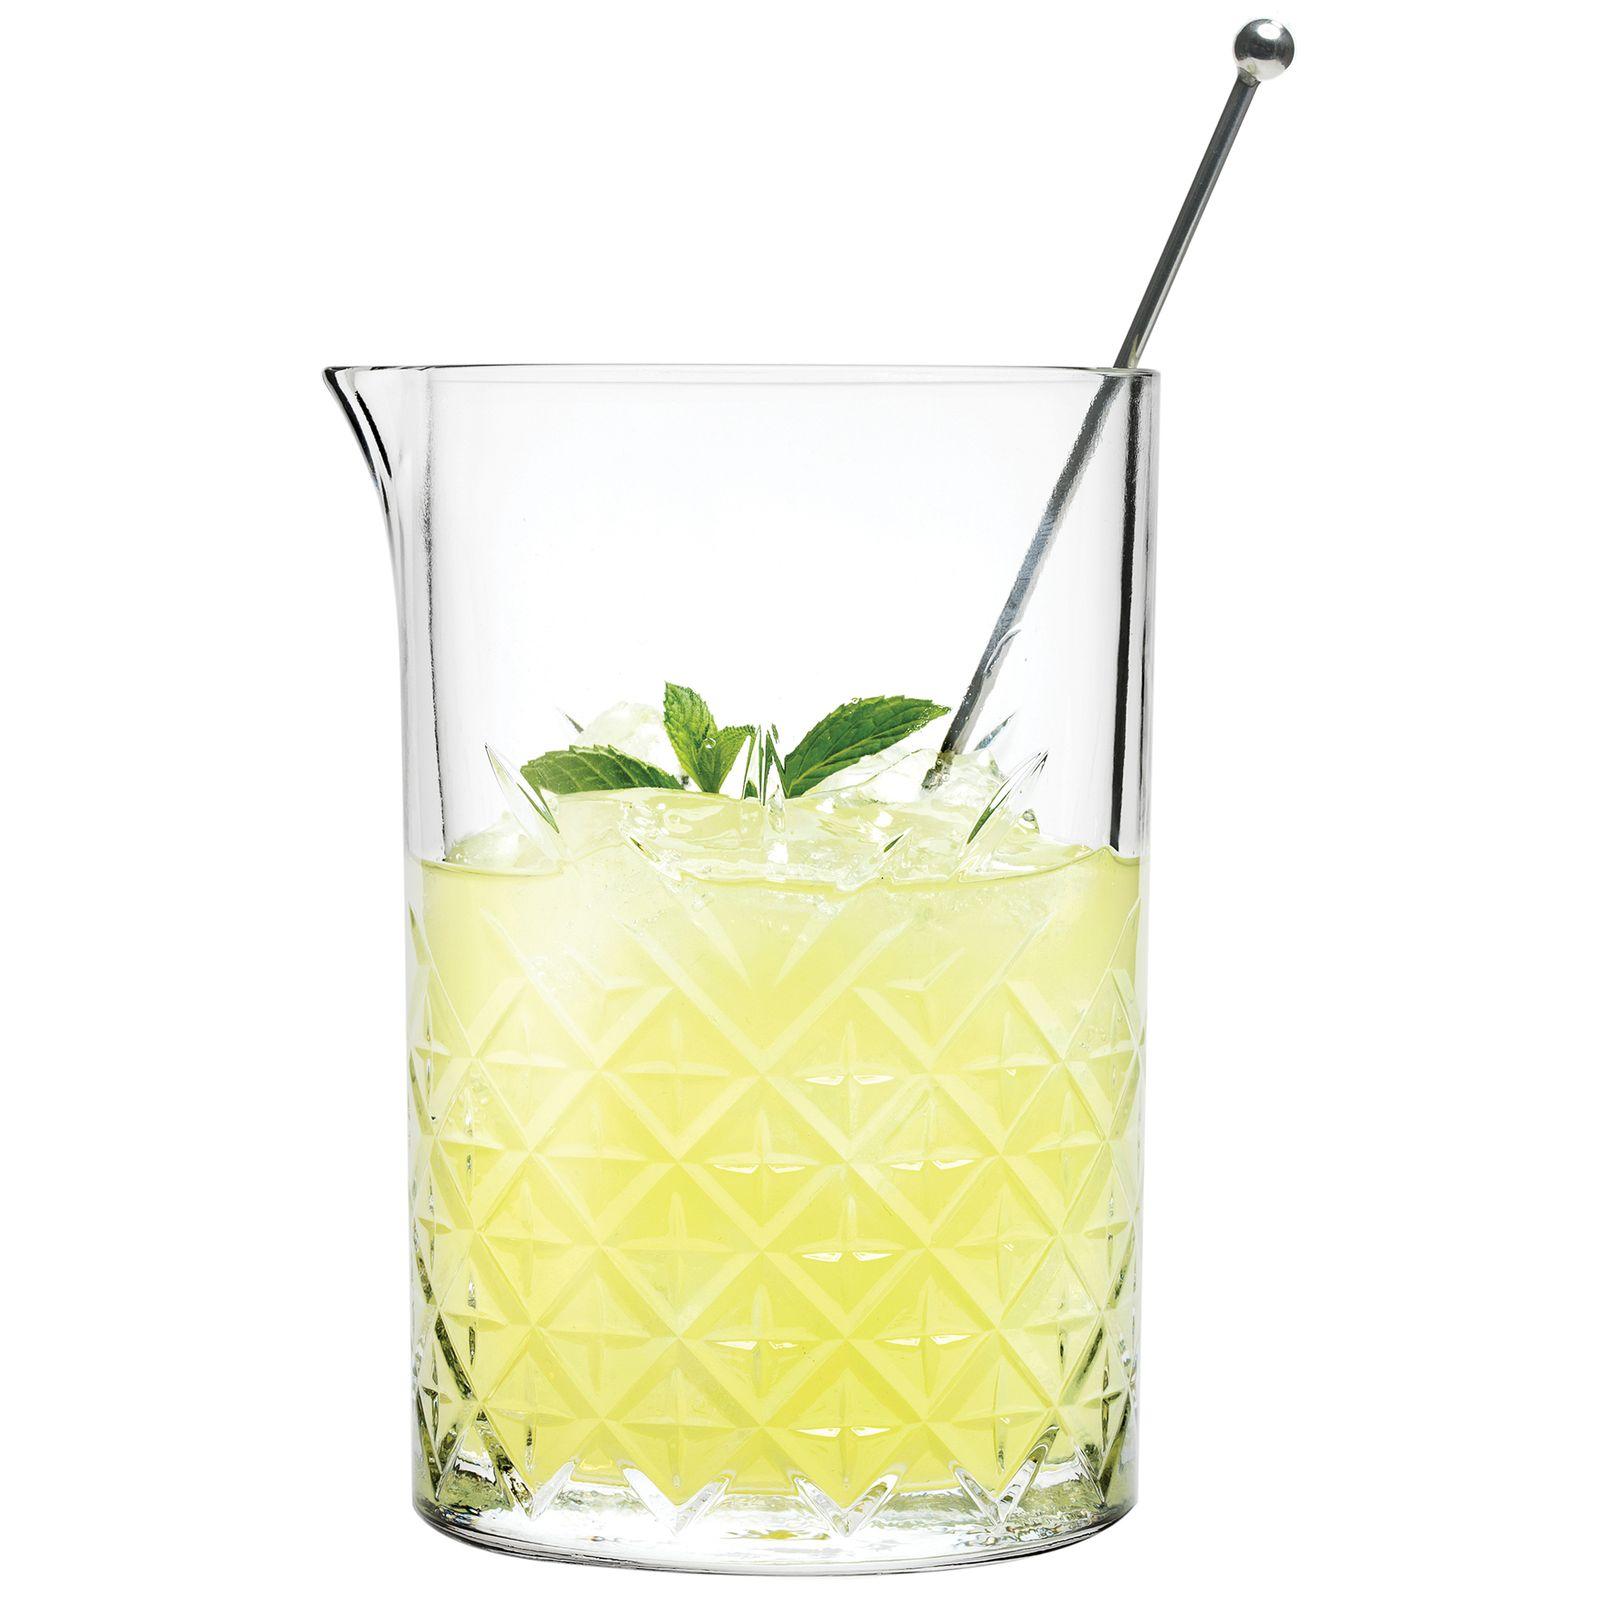 Bartending glass 725 ml Timeless PASABAHCE